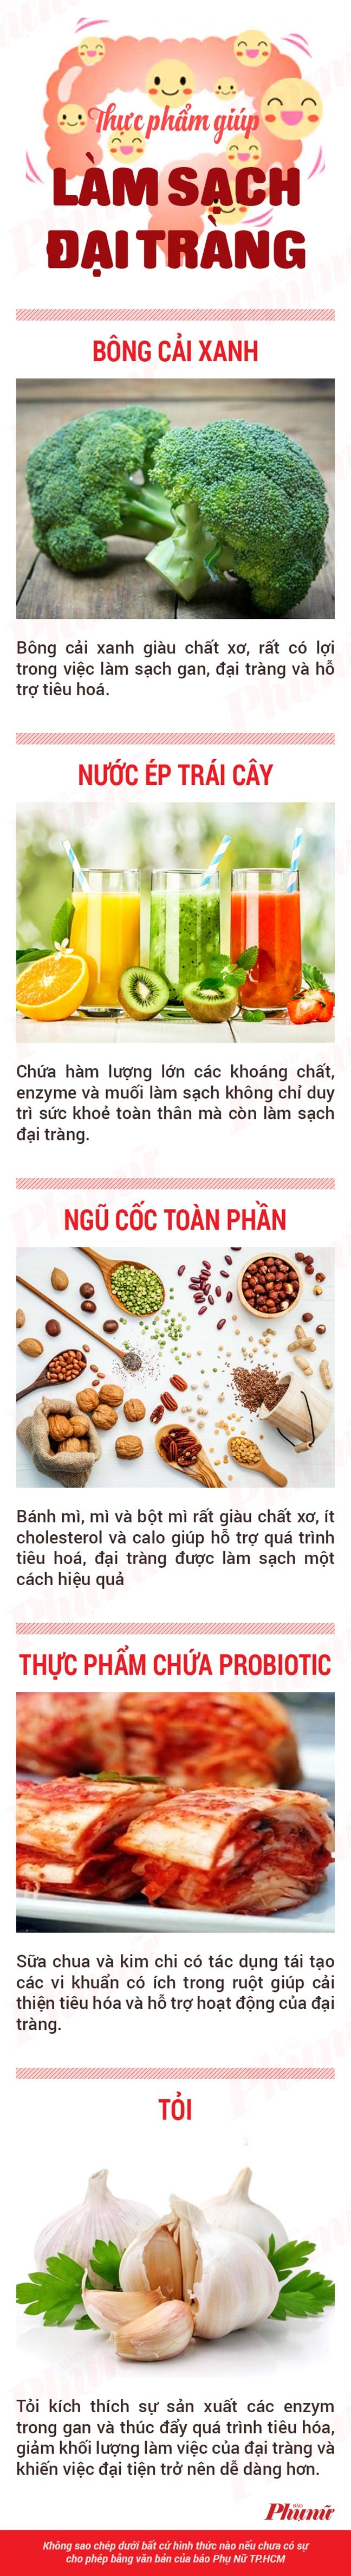 Thuc pham giup thai doc cho ruot gia